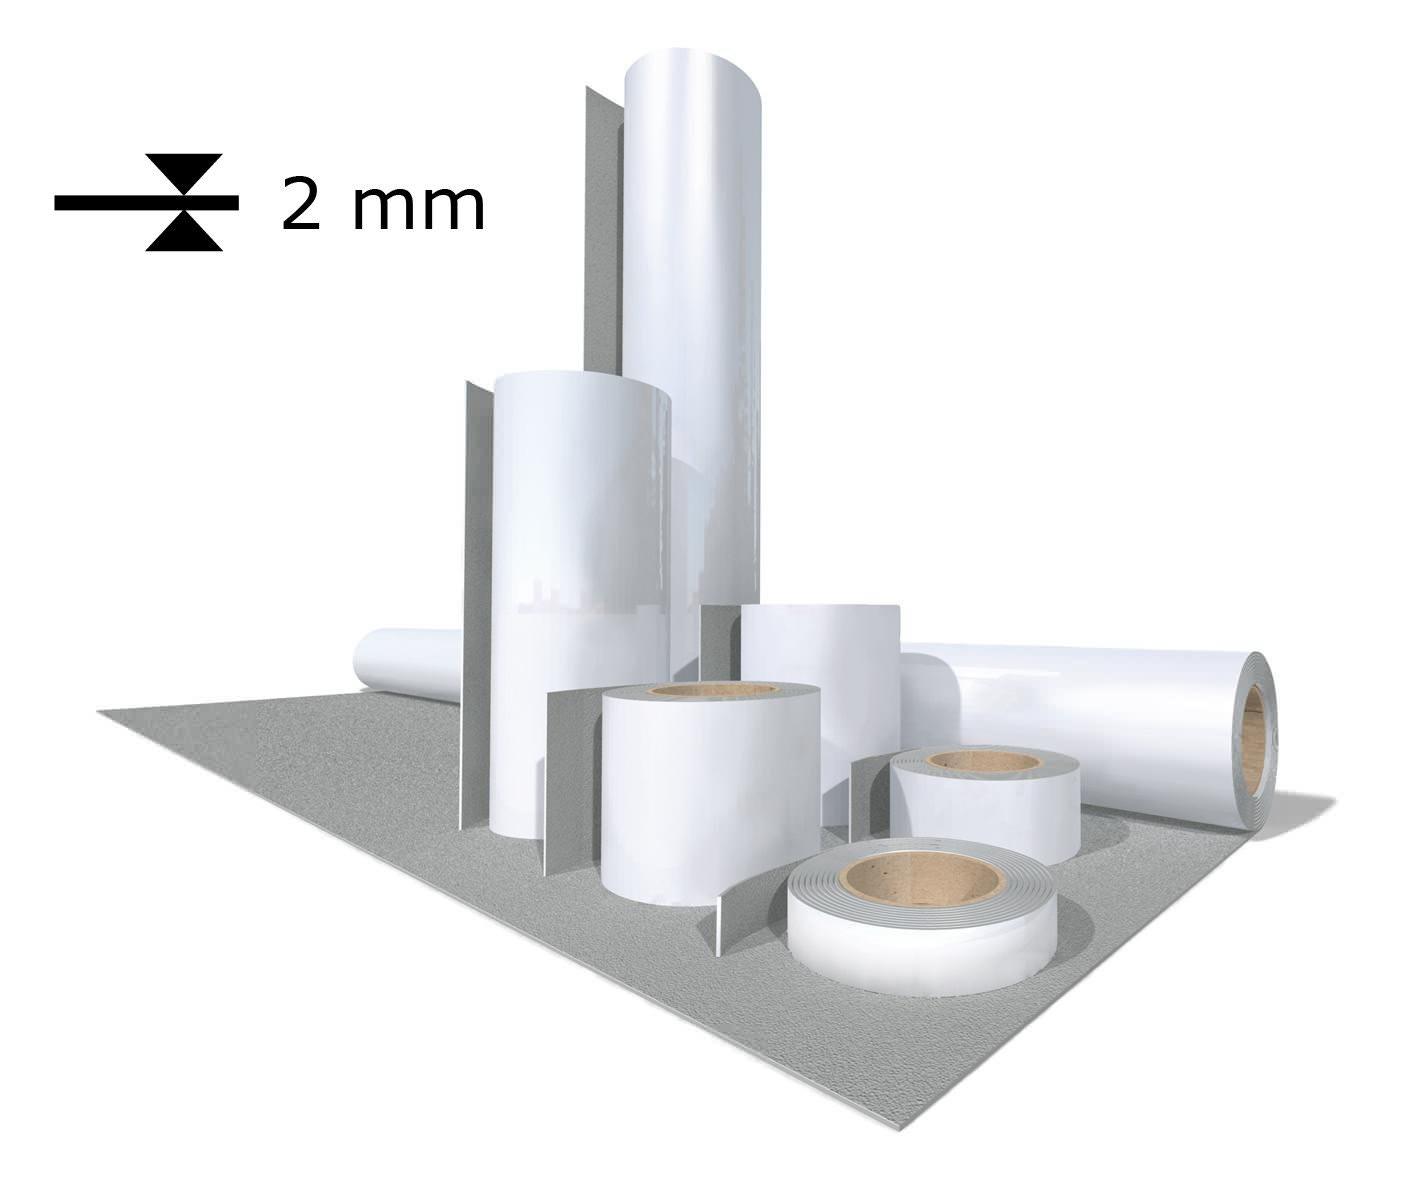 Rouleau antidérapant adhésif 2 mm